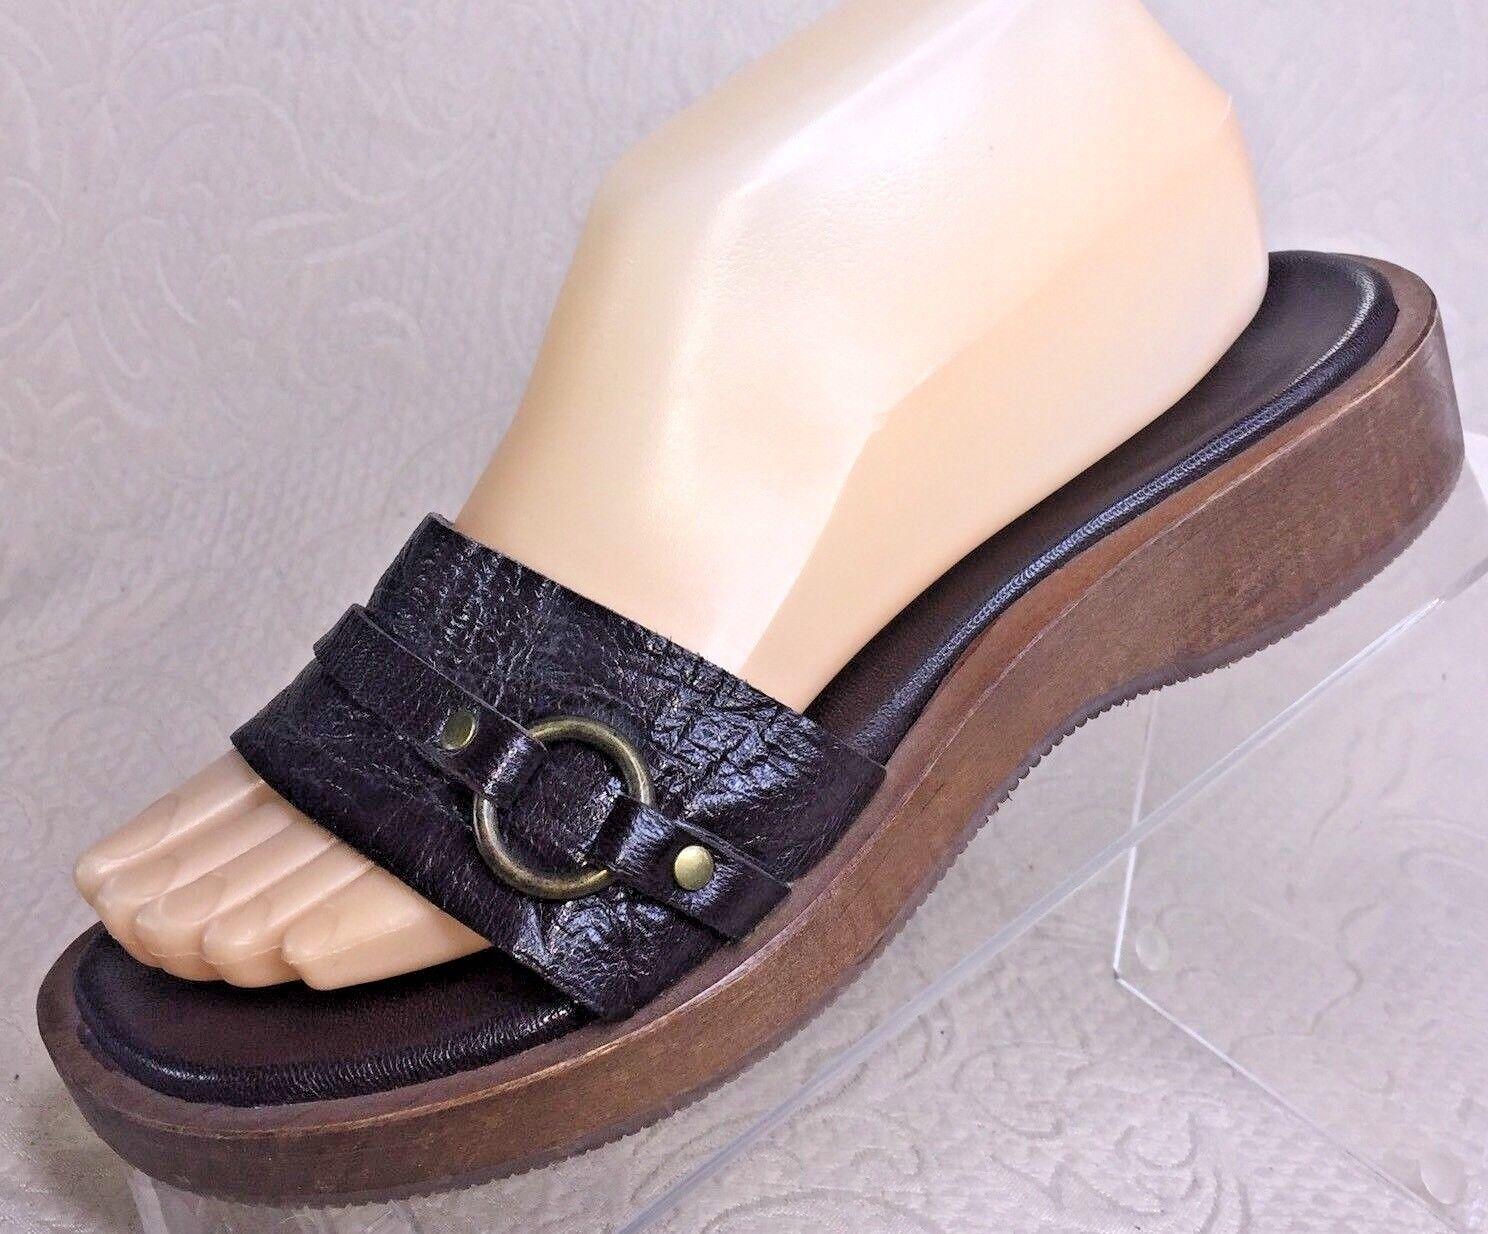 J CREW Women 7 Sandal Brown Leather Wood Slip on Slide Wedge Heel Flatform shoes